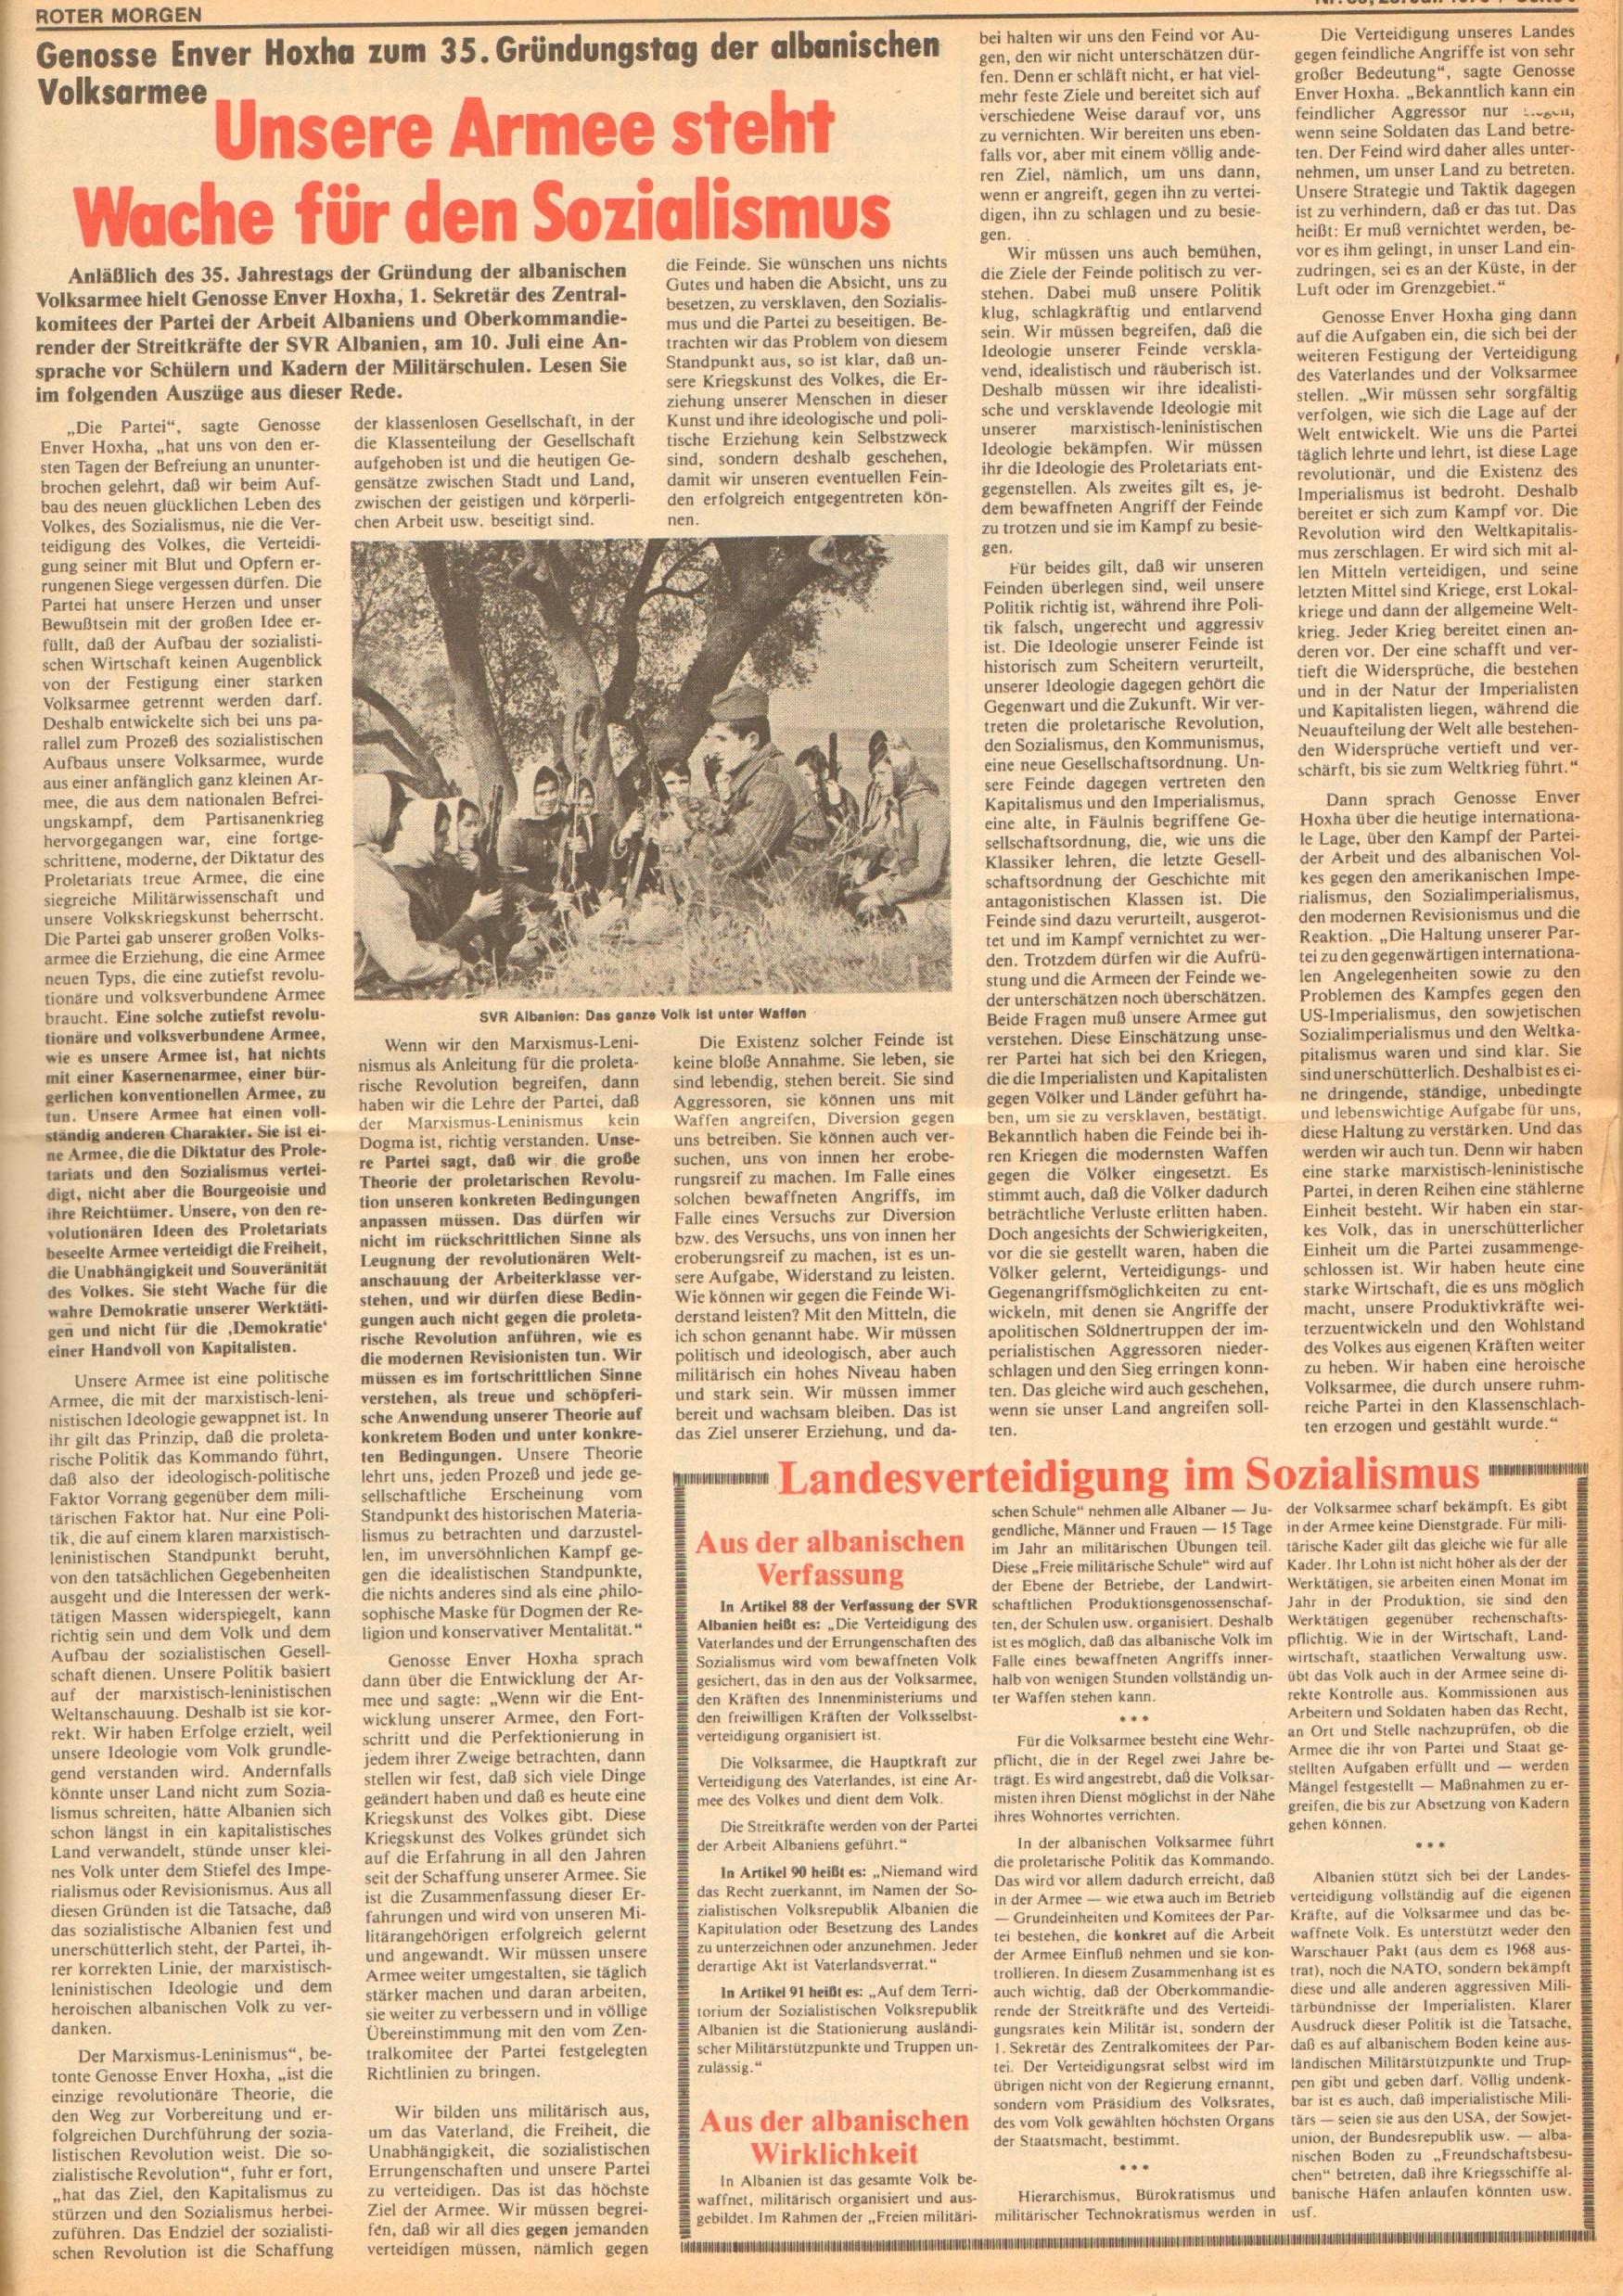 Roter Morgen, 12. Jg., 28. Juli 1978, Nr. 30, Seite 9